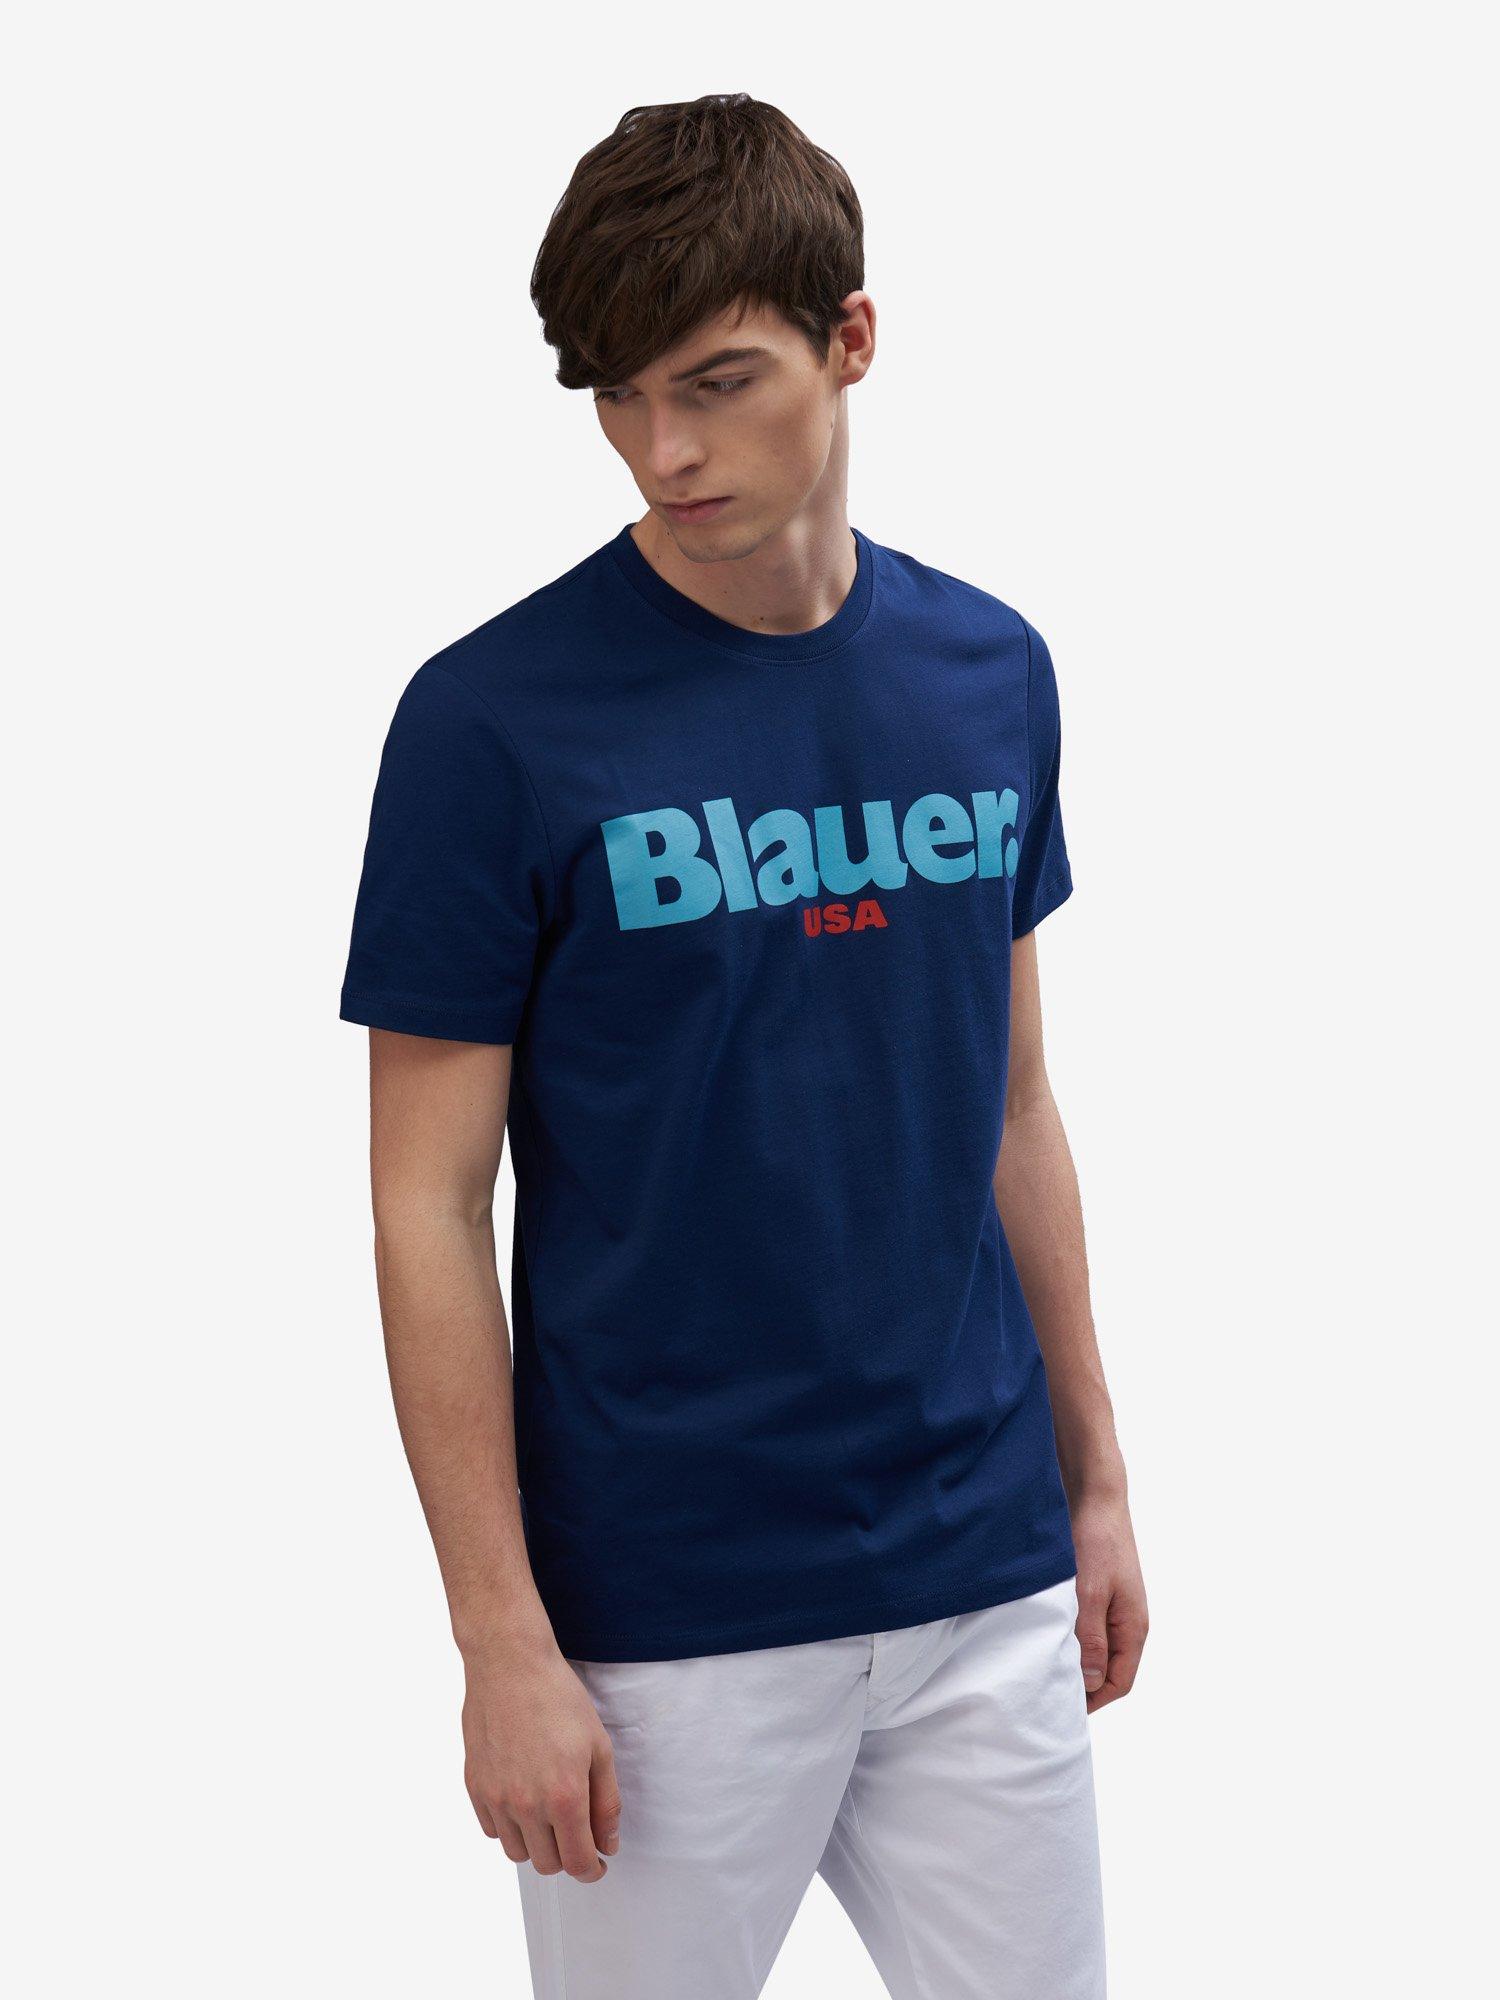 T-SHIRT BLAUER USA - Blauer